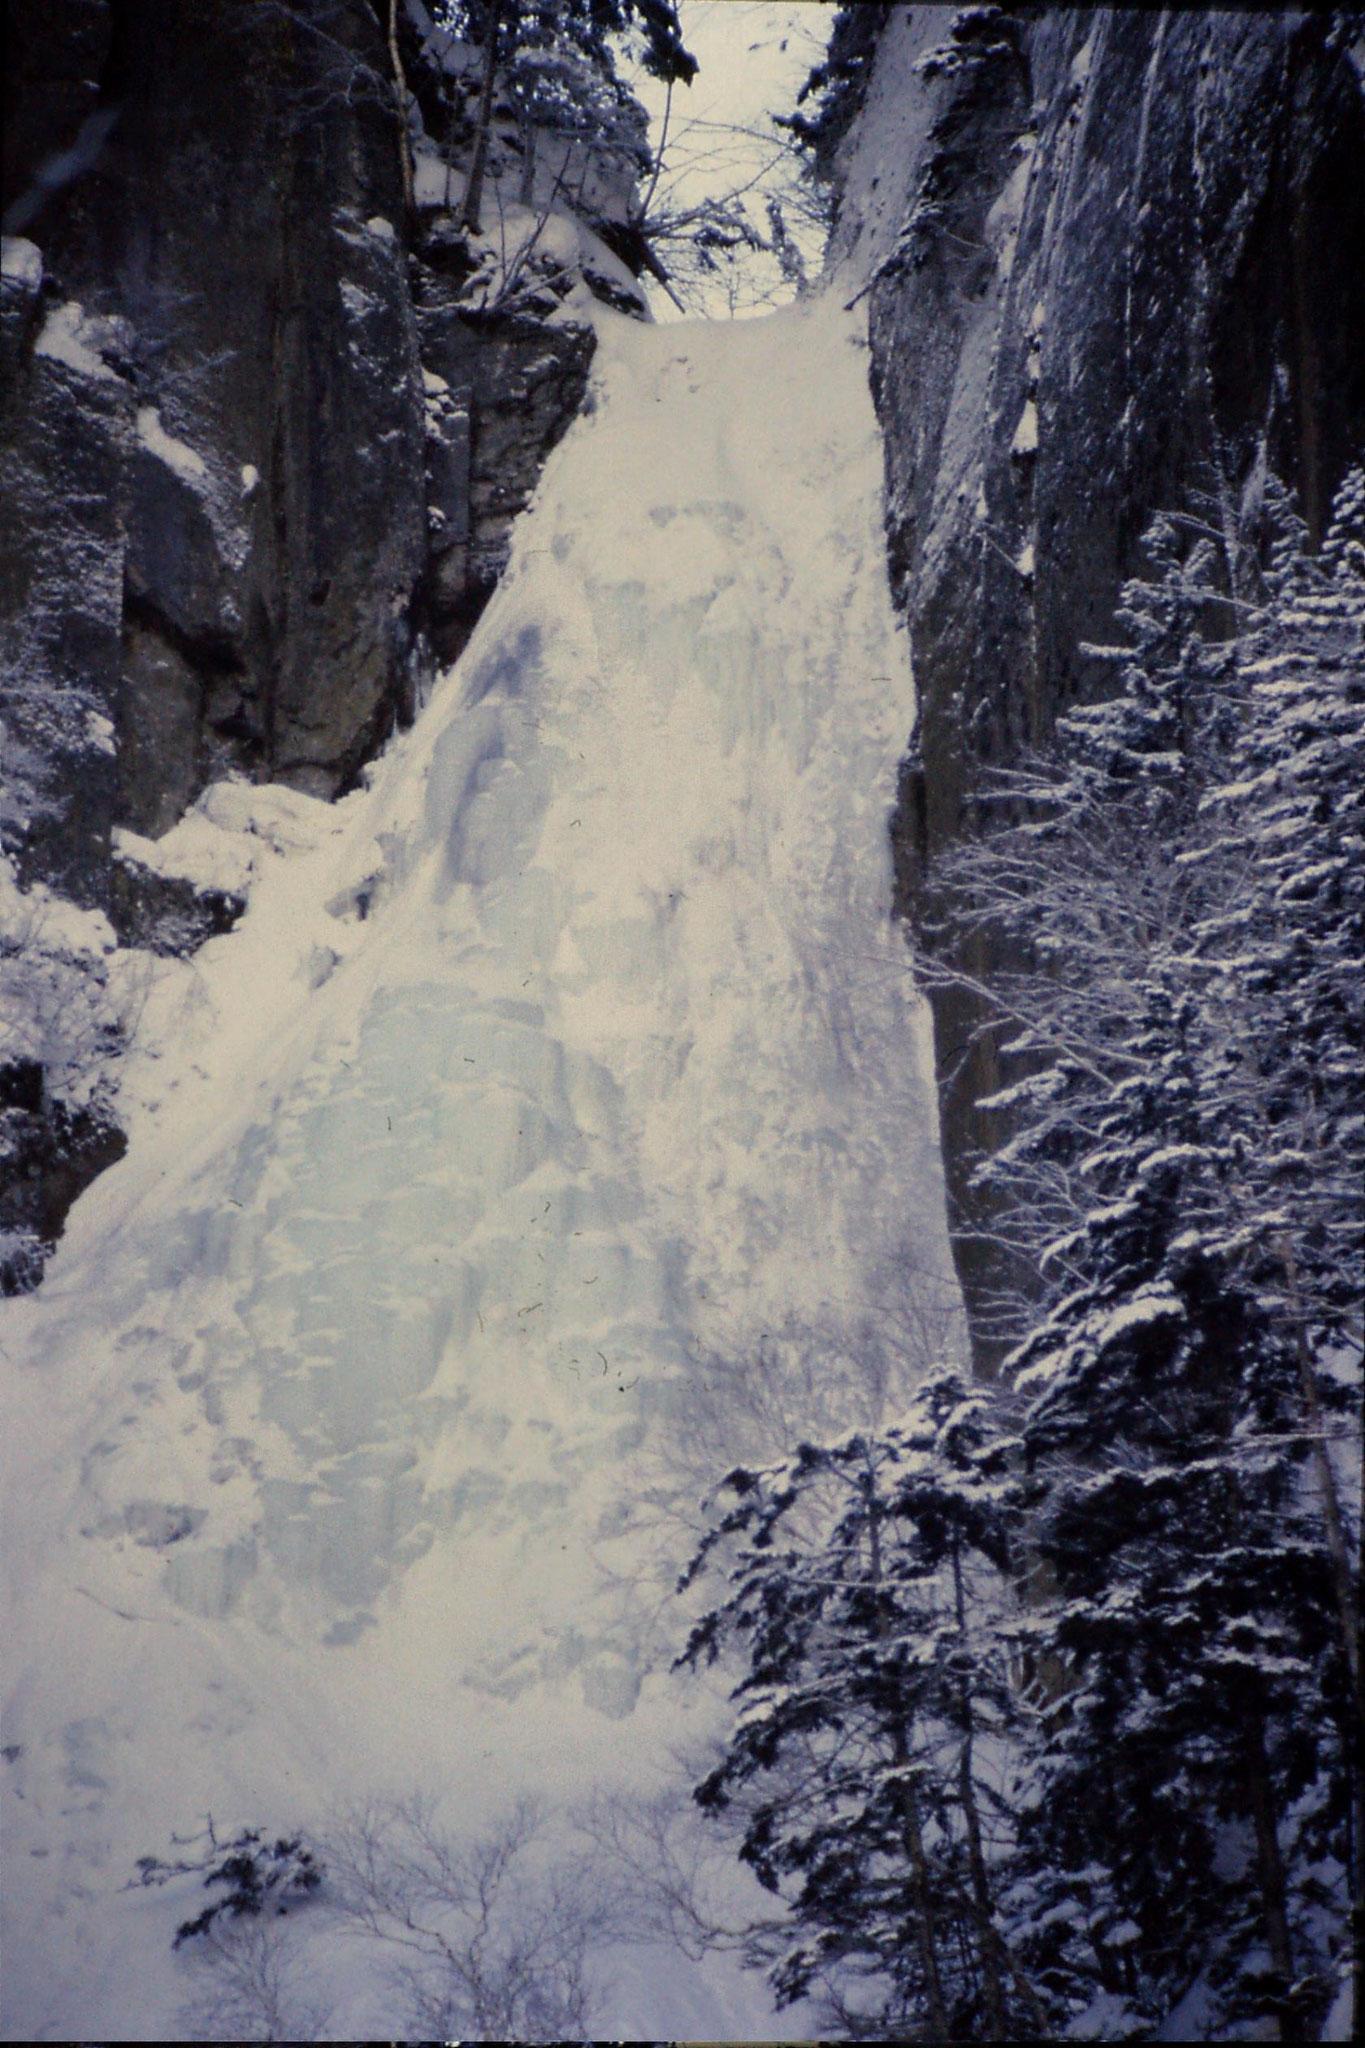 12/1/1989: 17: Sounkyo Onsen Gorge, Teusho-no-iwa